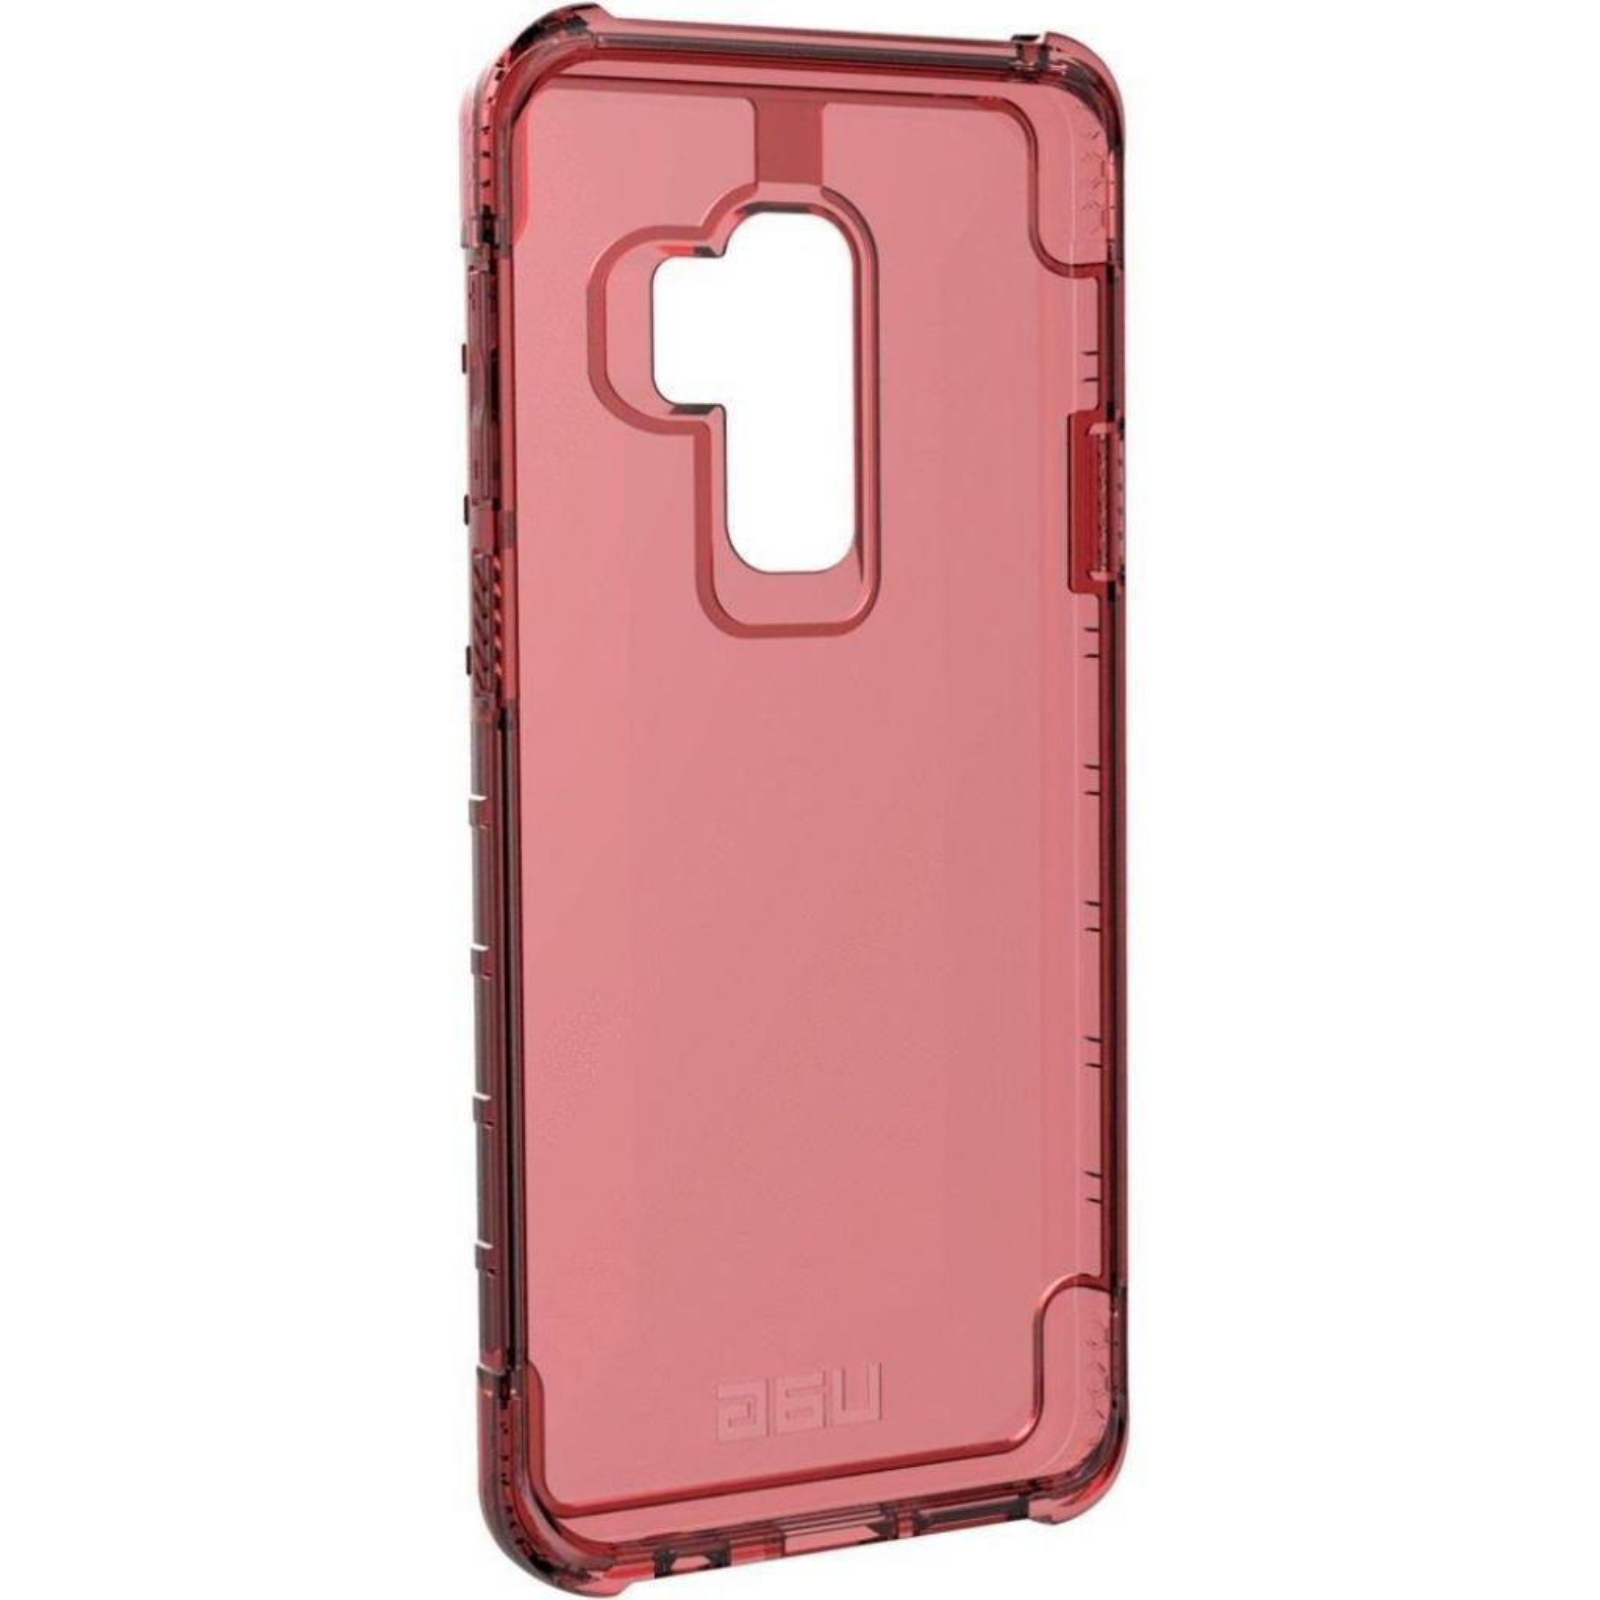 Чехол для моб. телефона Urban Armor Gear Galaxy S9+ PlyoCrimson (GLXS9PLS-Y-CR) изображение 2